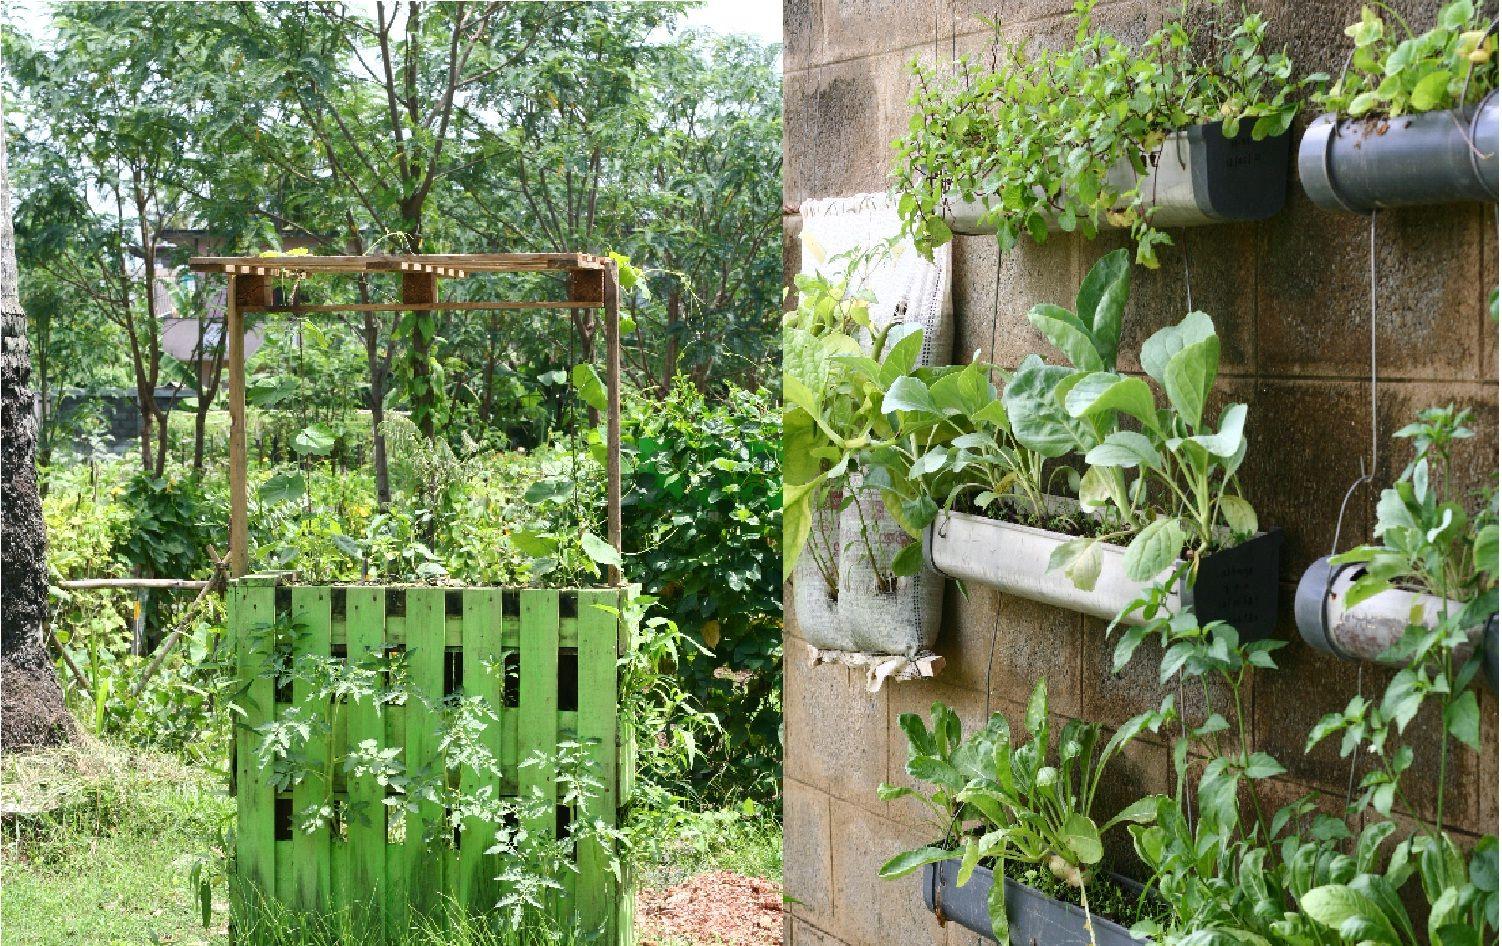 vertical-gardening | Garden | Pinterest | Gardens, Small homes and ...